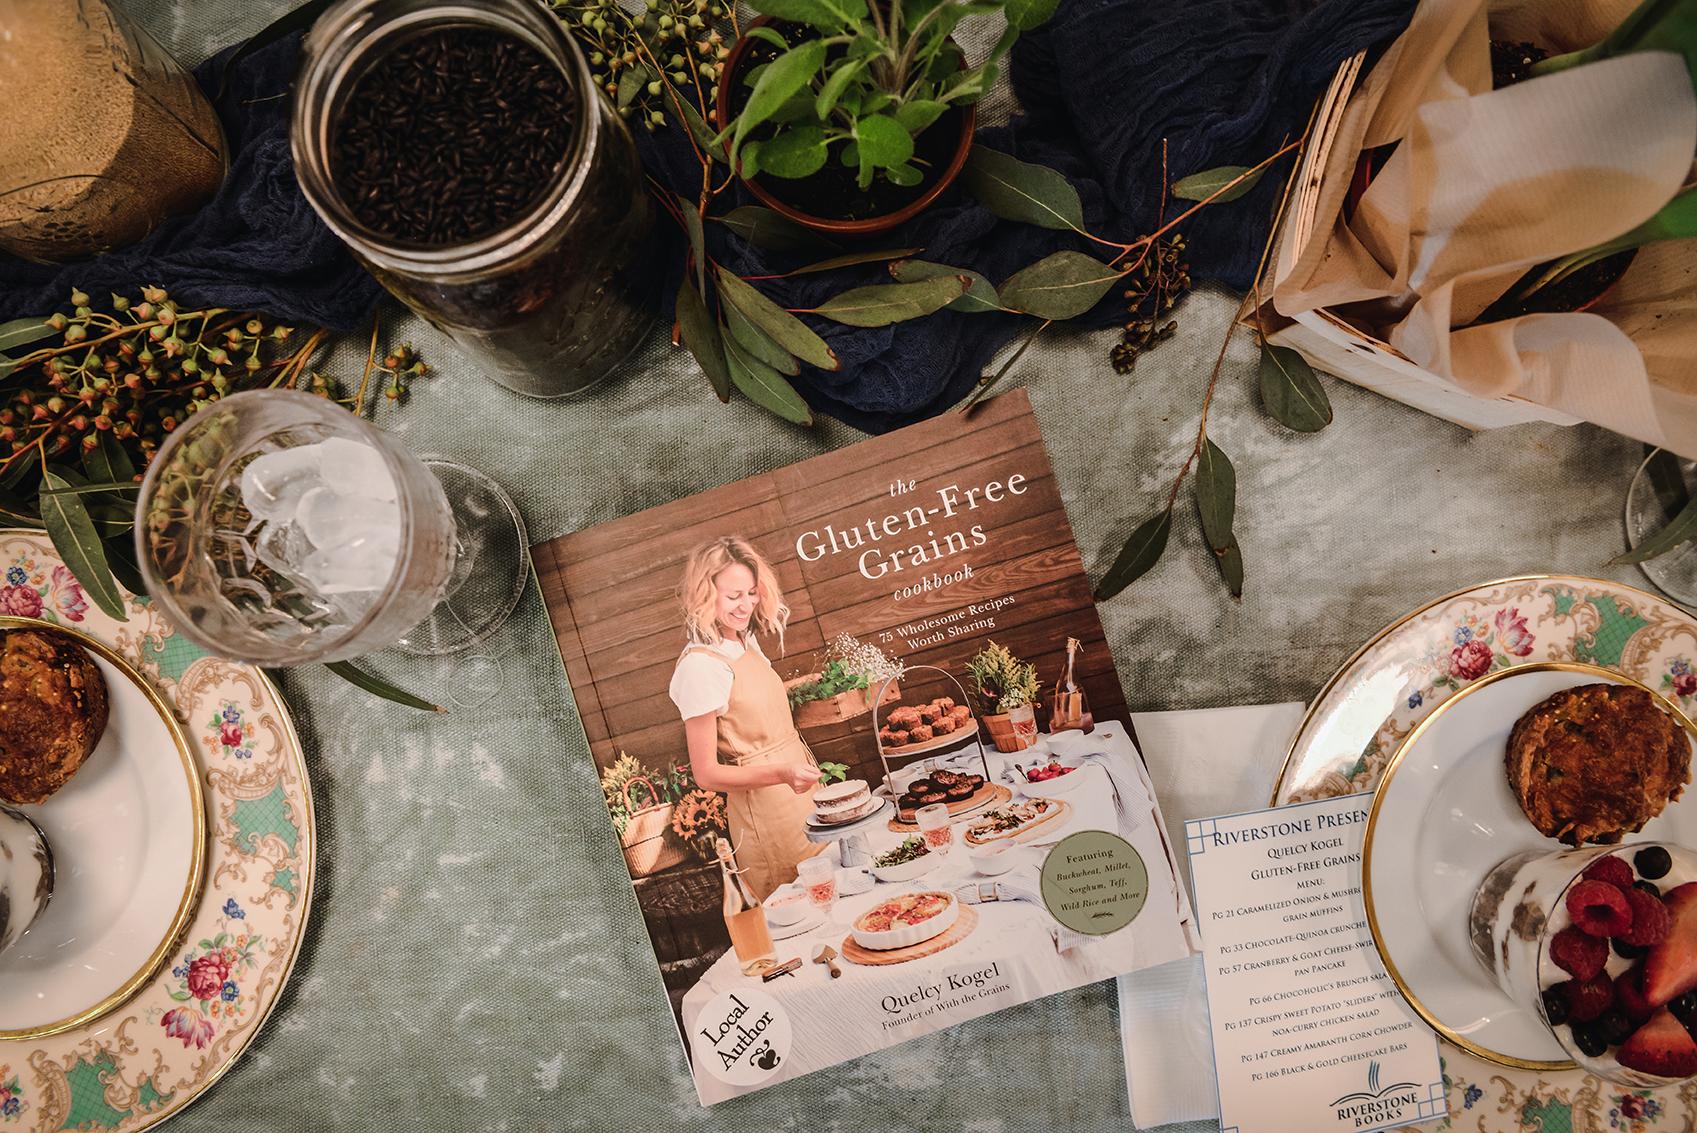 The Gluten-Free Grains Cookbook is One Week Old